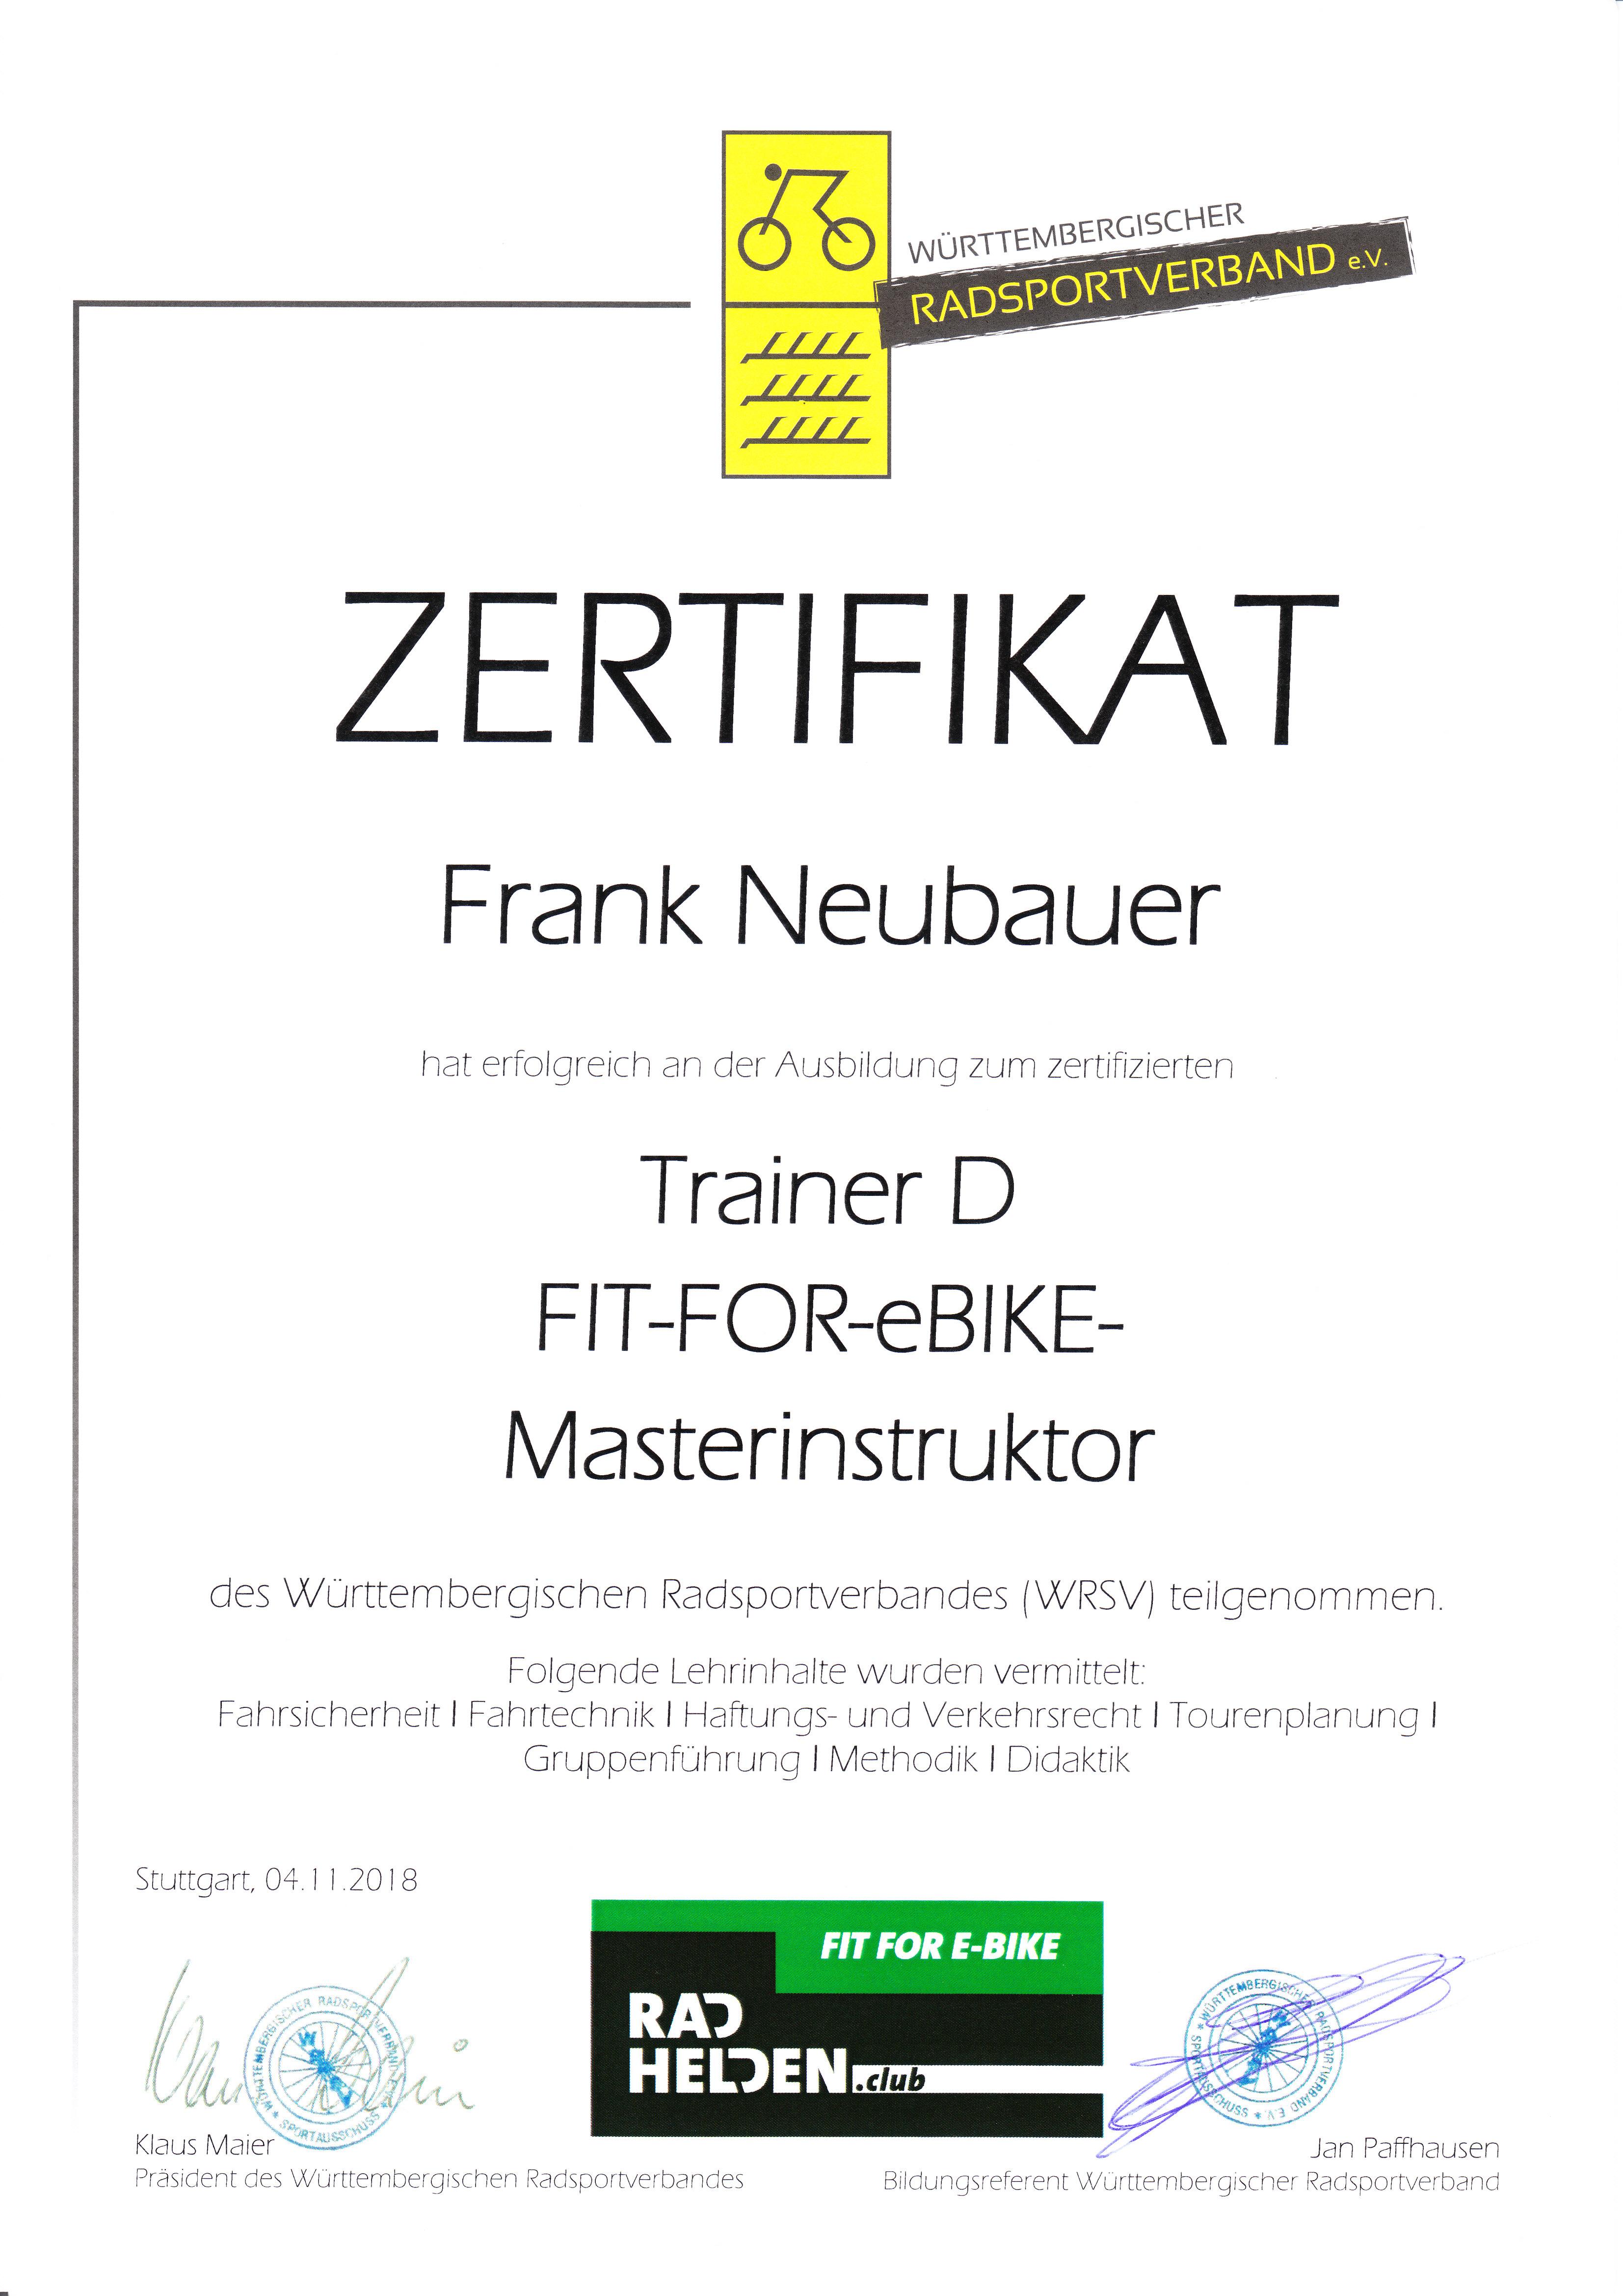 Masterinstruktor Zertifikat